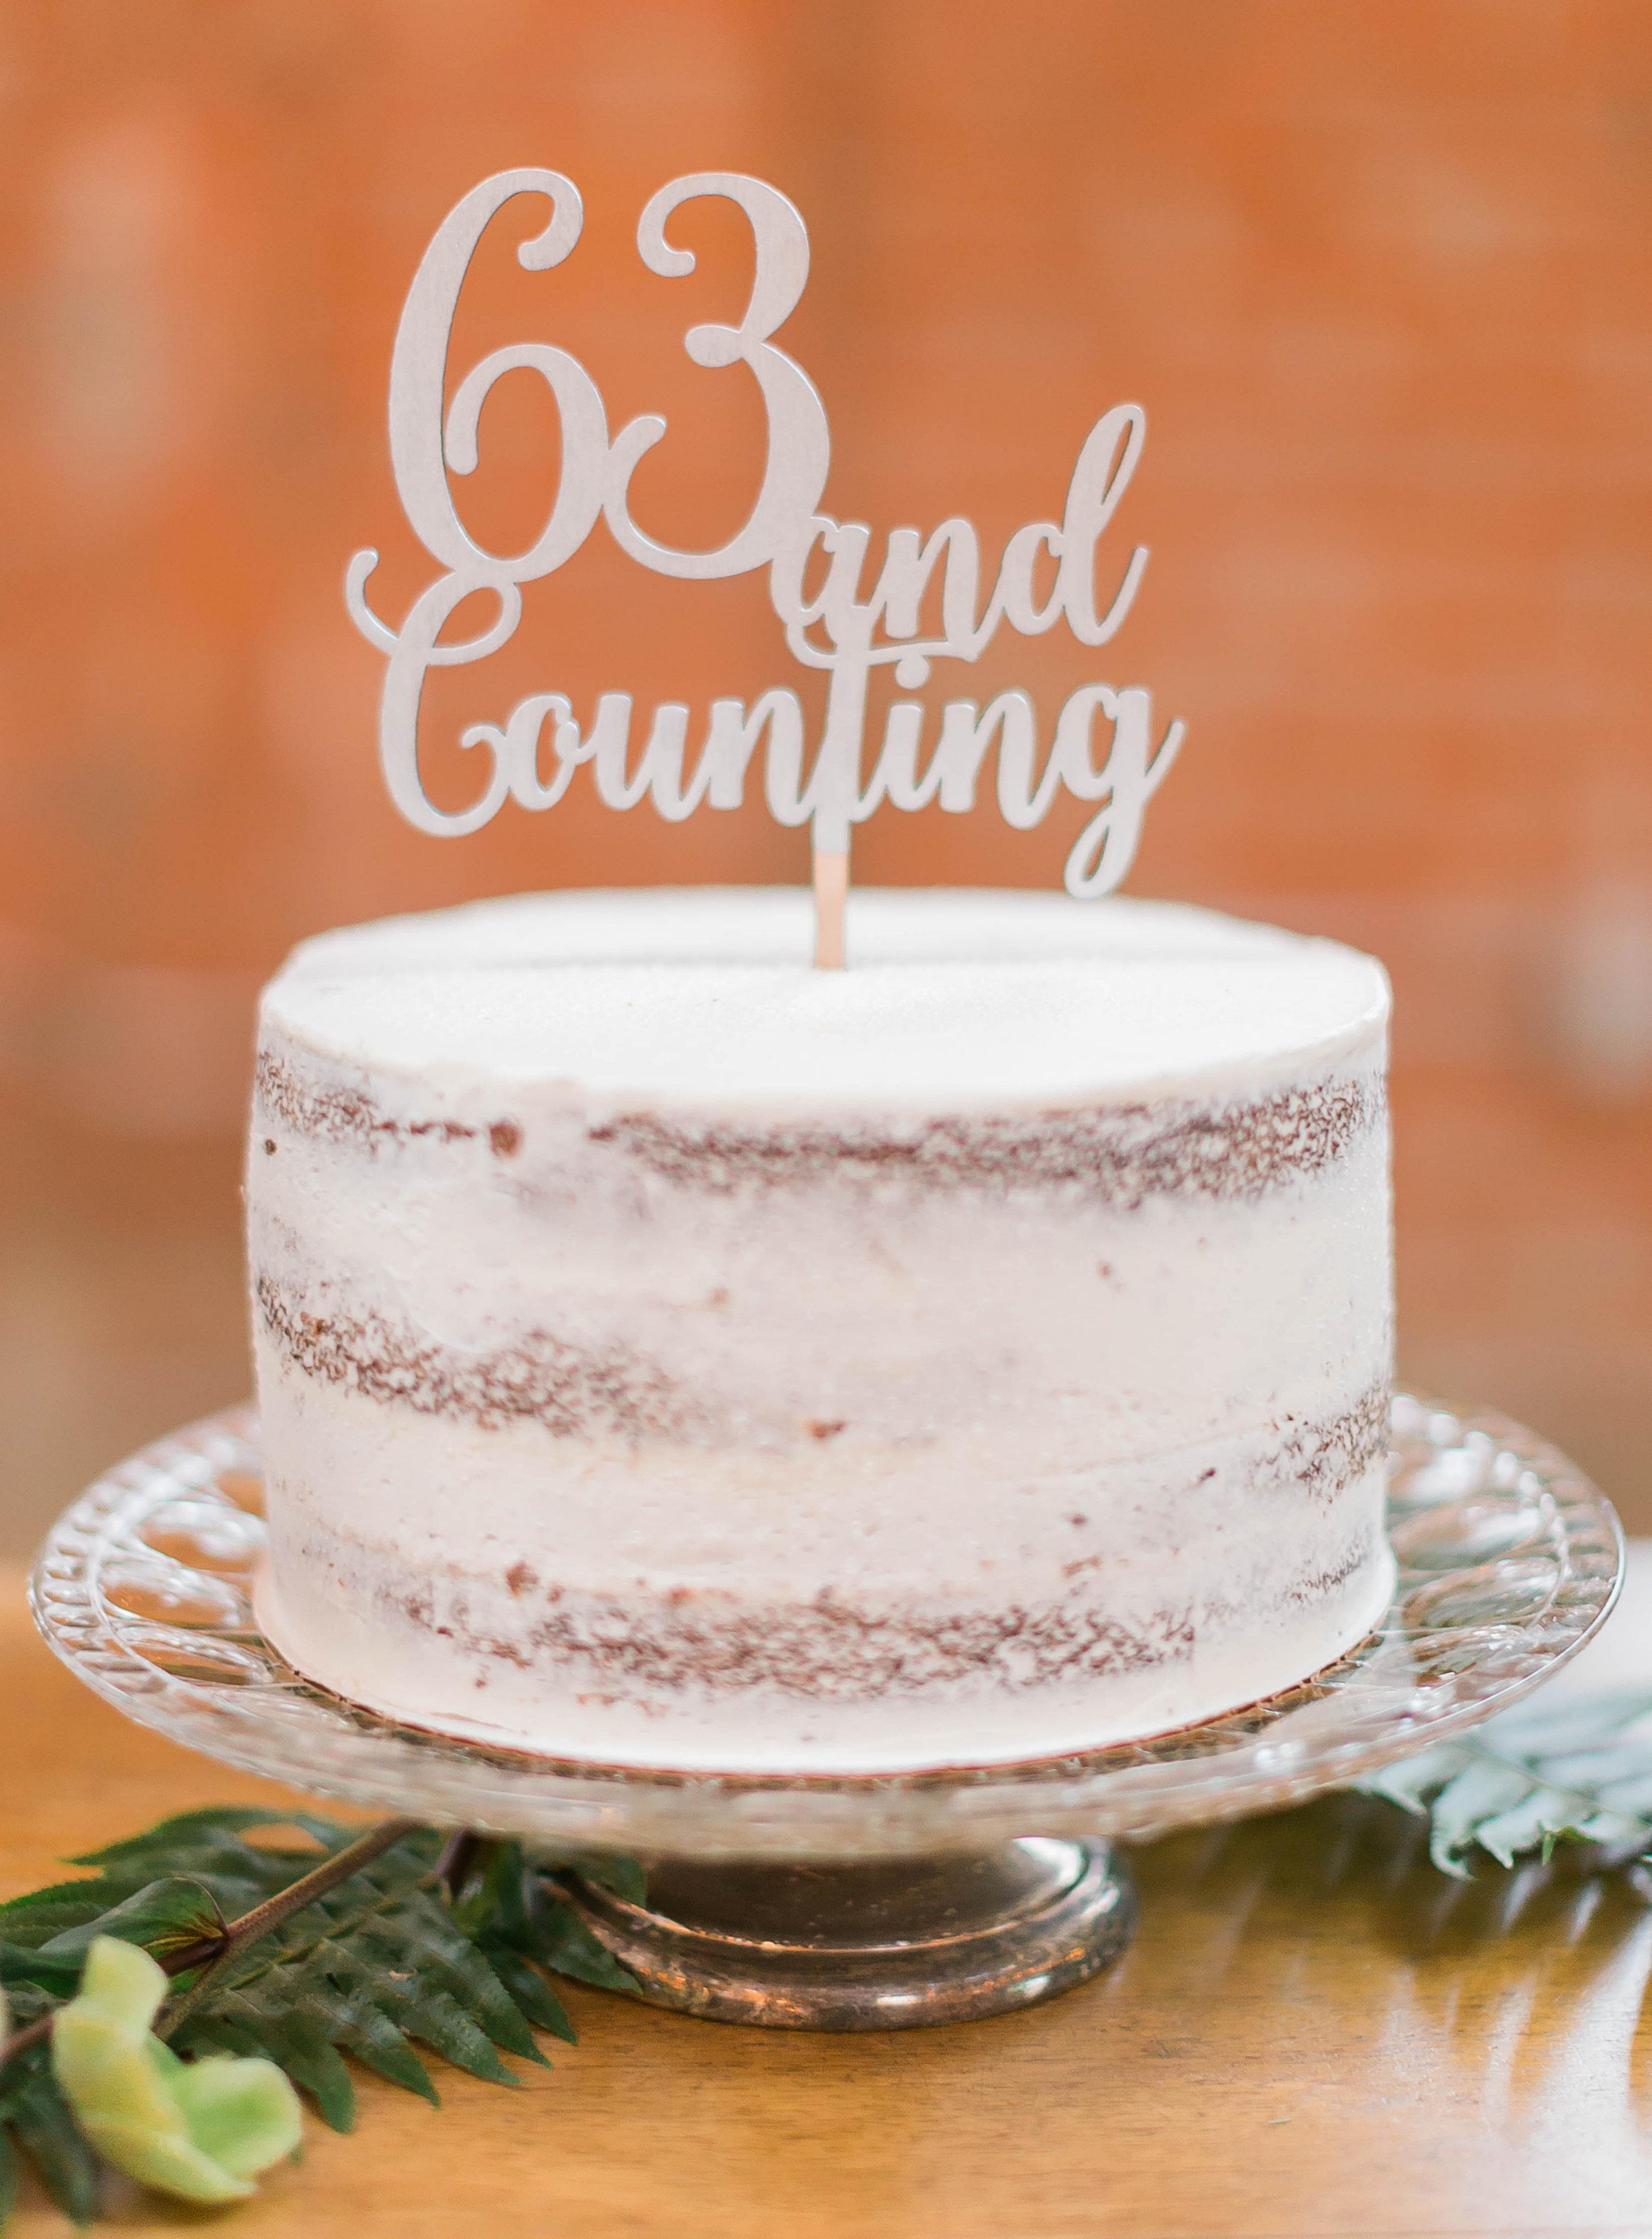 meadows events | wedding anniversary cake